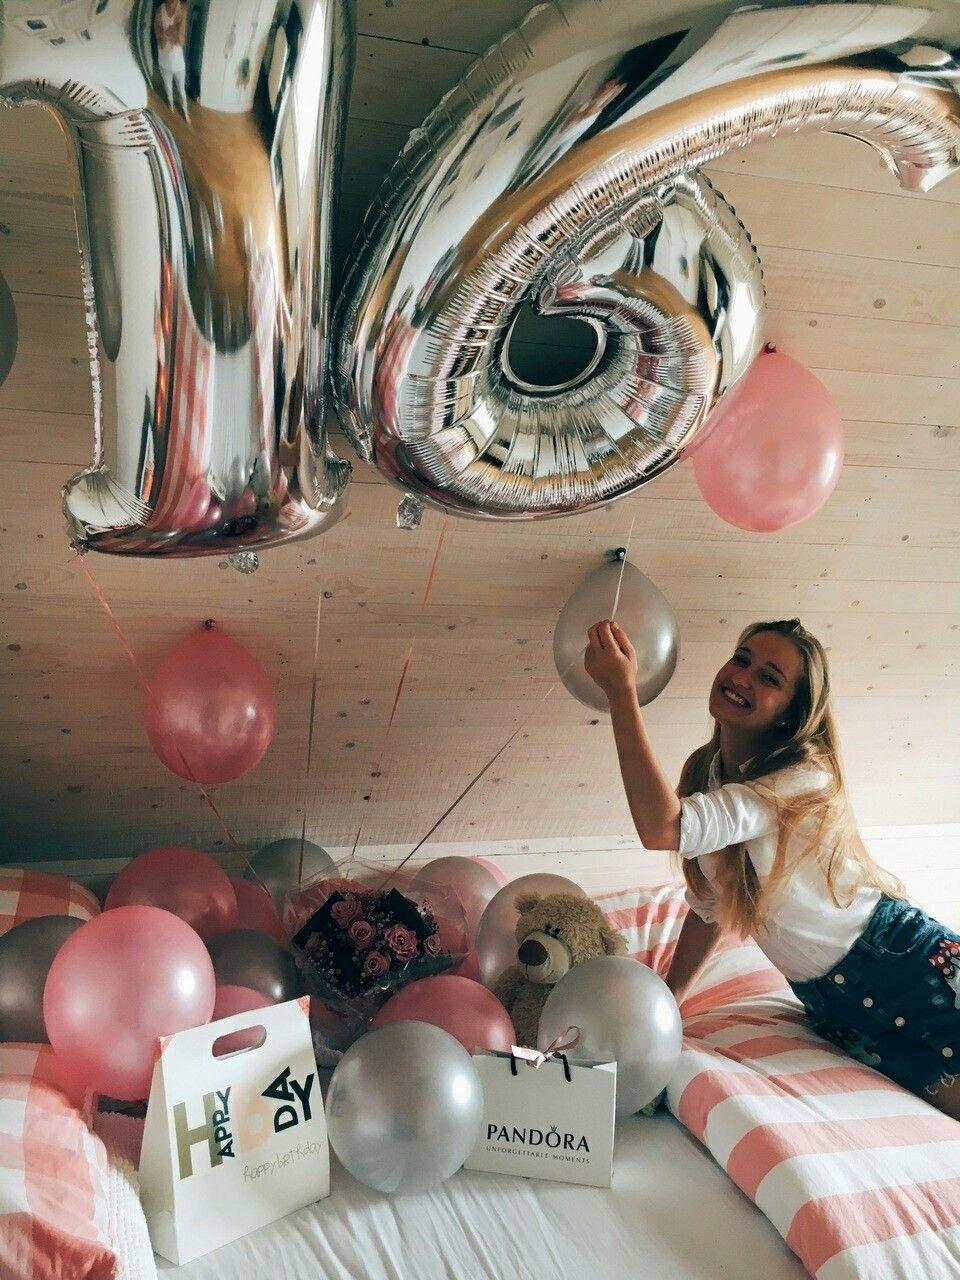 Rollody fiesta de cumplea os pinterest for Cuartos decorados feliz cumpleanos